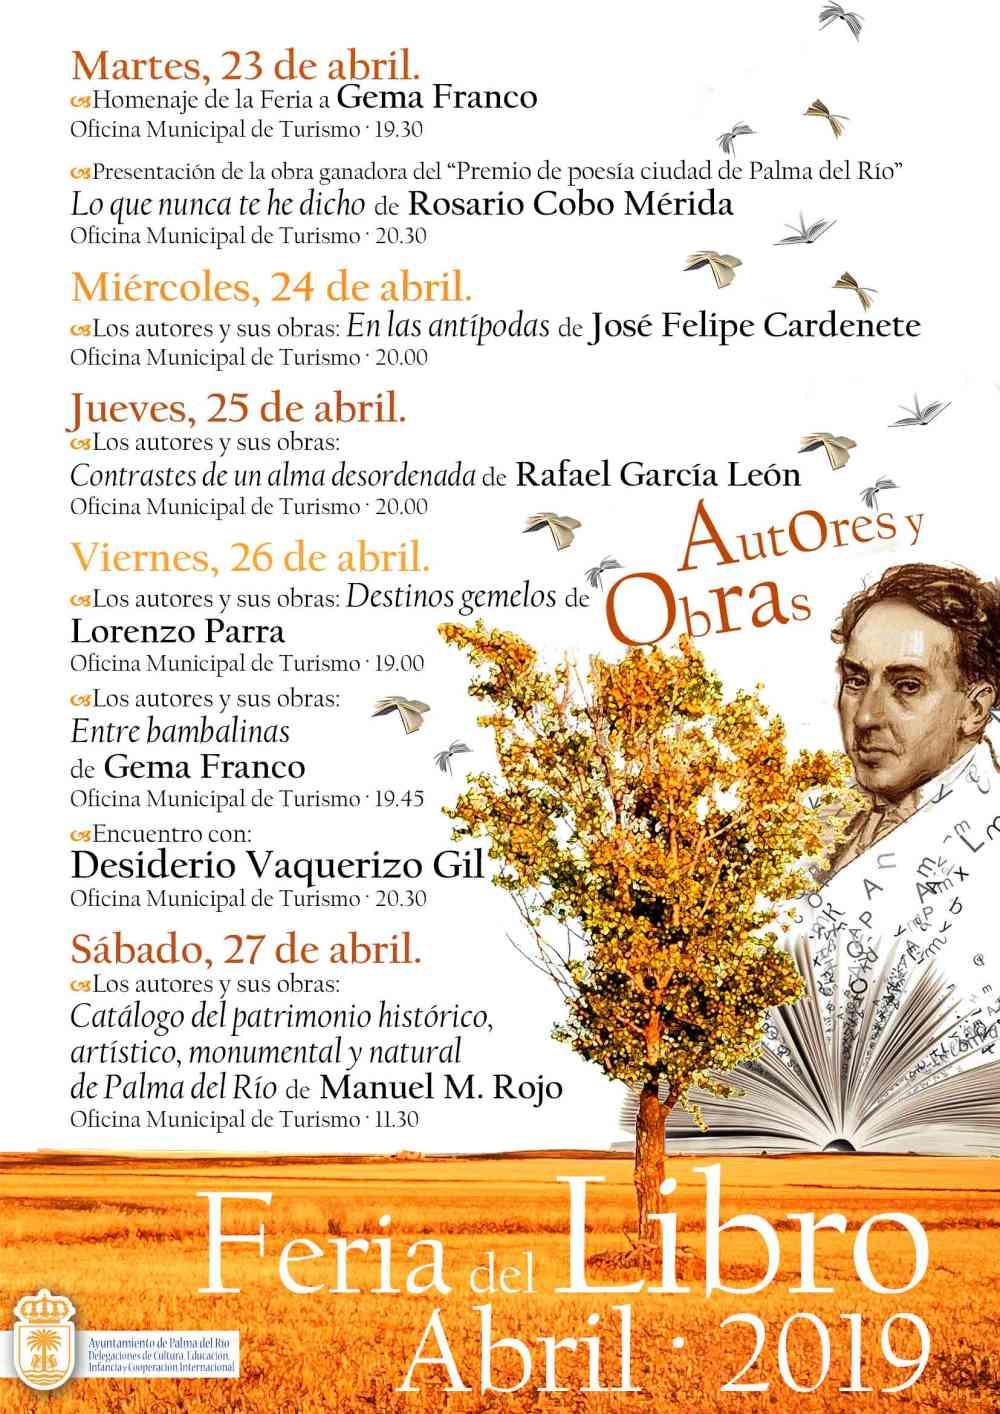 https://www.palmadelrio.es/sites/default/files/web-feria-libro-autores-2019.jpg